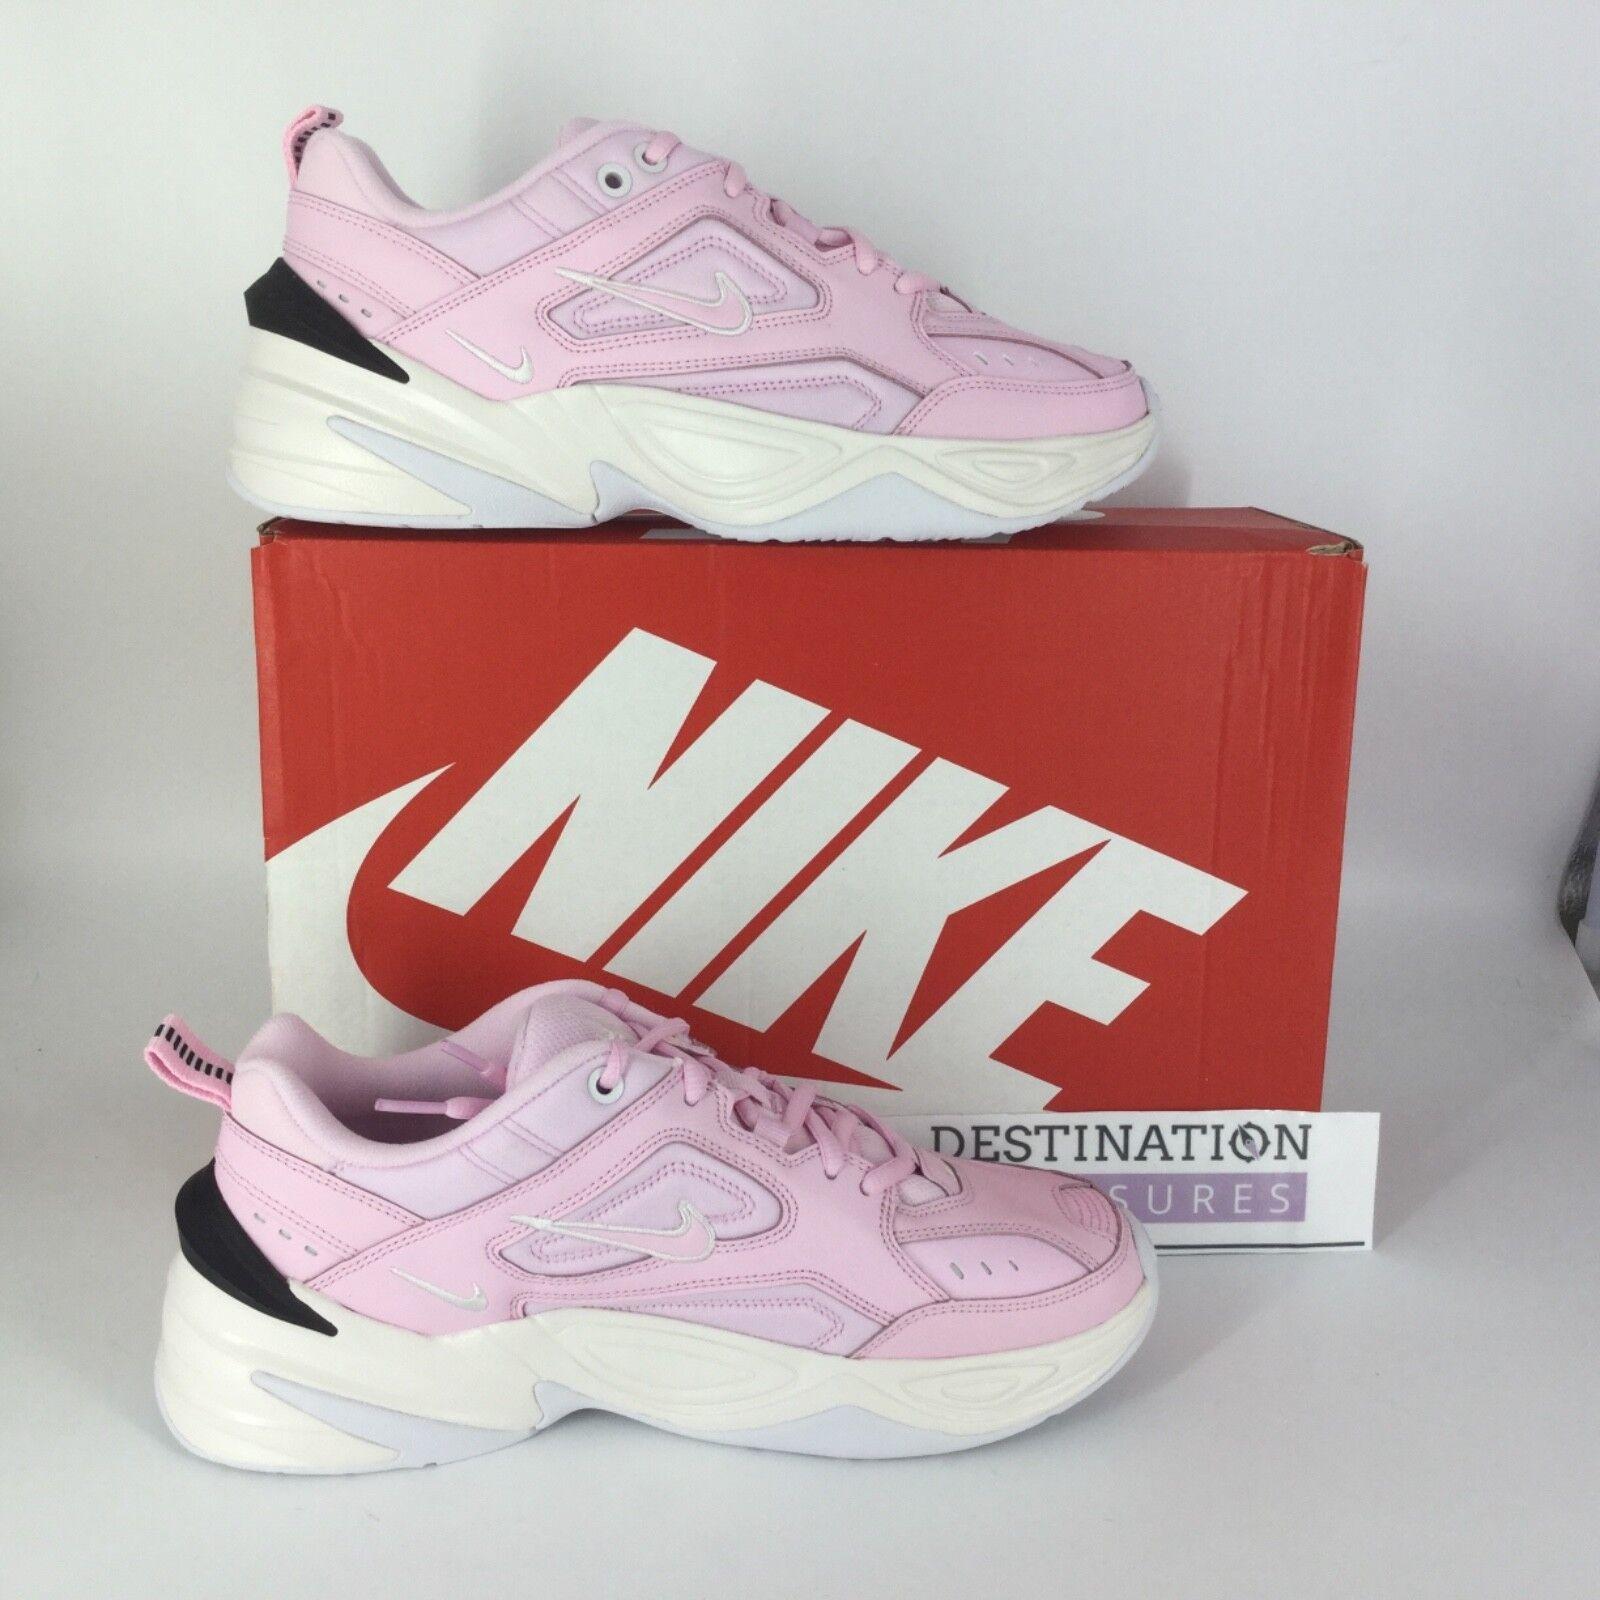 Nike M2K Tekno PINK Sneakers Women's Size Size Size 8.5 NIB AO3108 600 AUTHENTIC f897e7